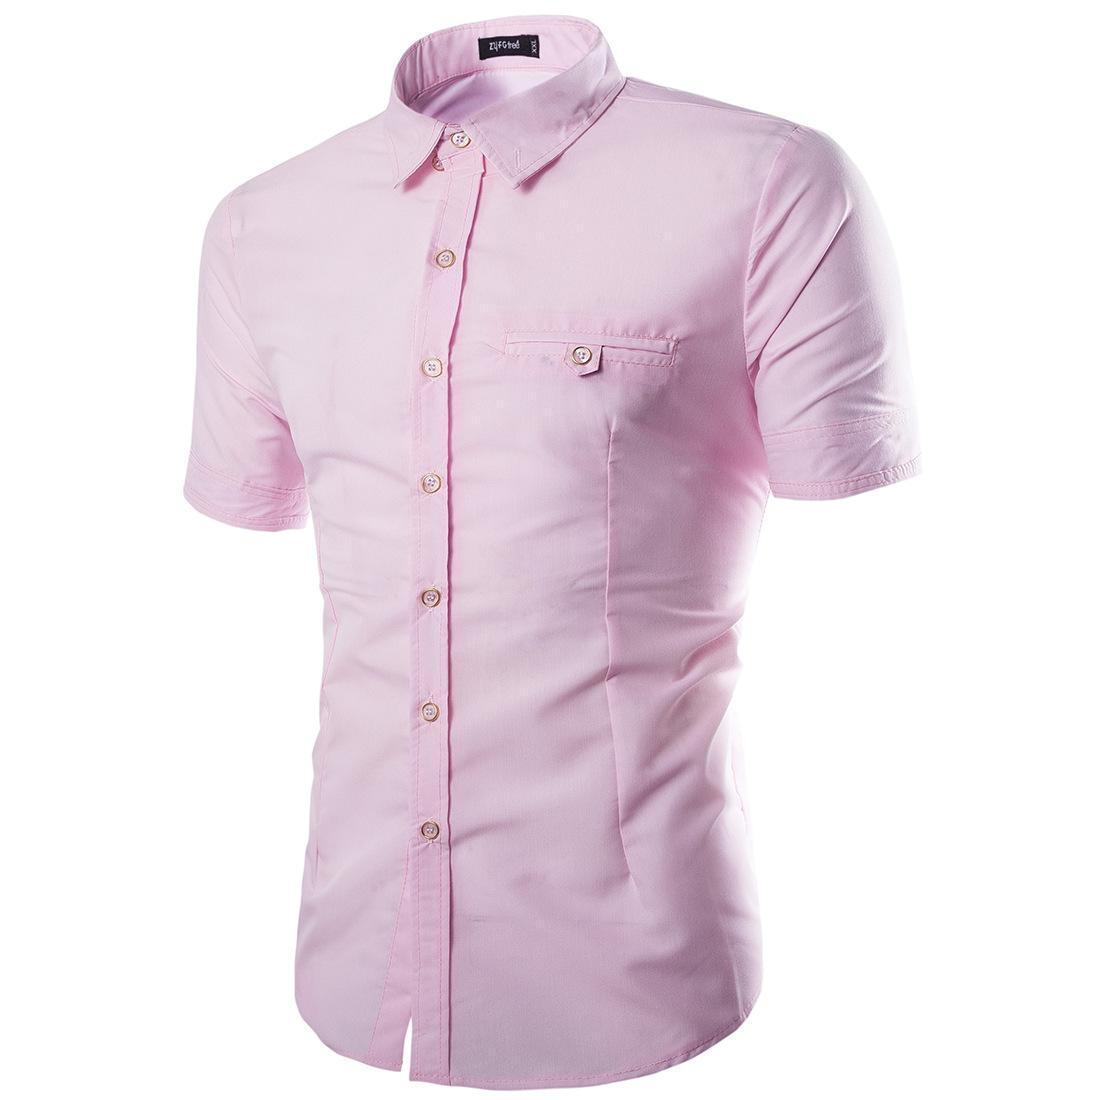 ab5a1c4ff8b Men Fashion Short sleeve Polo shirts Checked Pattern Business Formal T-shirt  short sleeve Slim